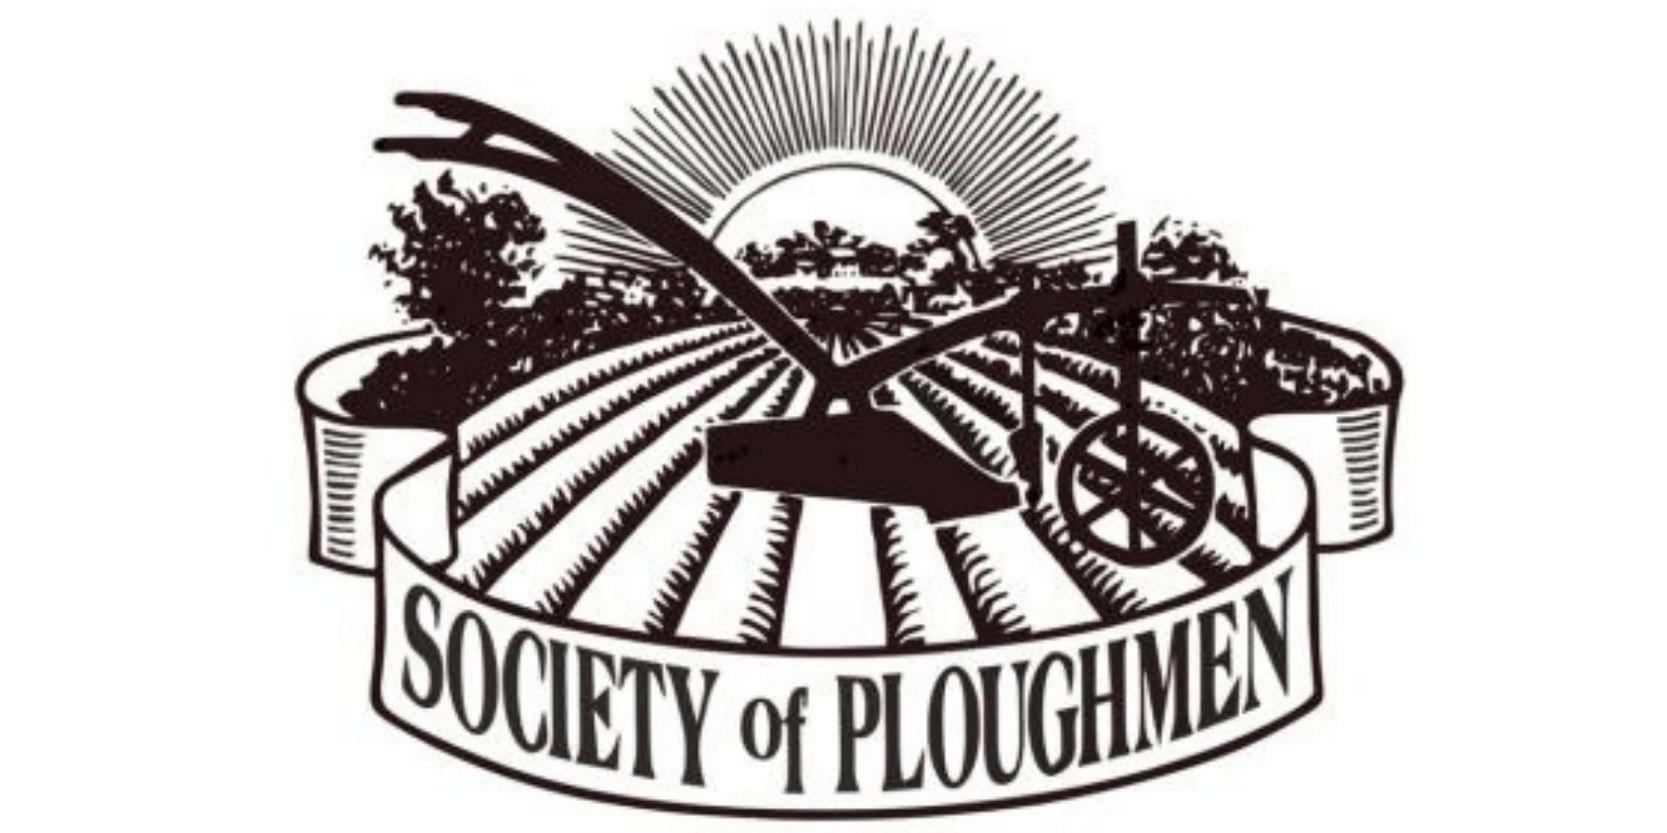 SOCIETY OF PLOUGHMEN